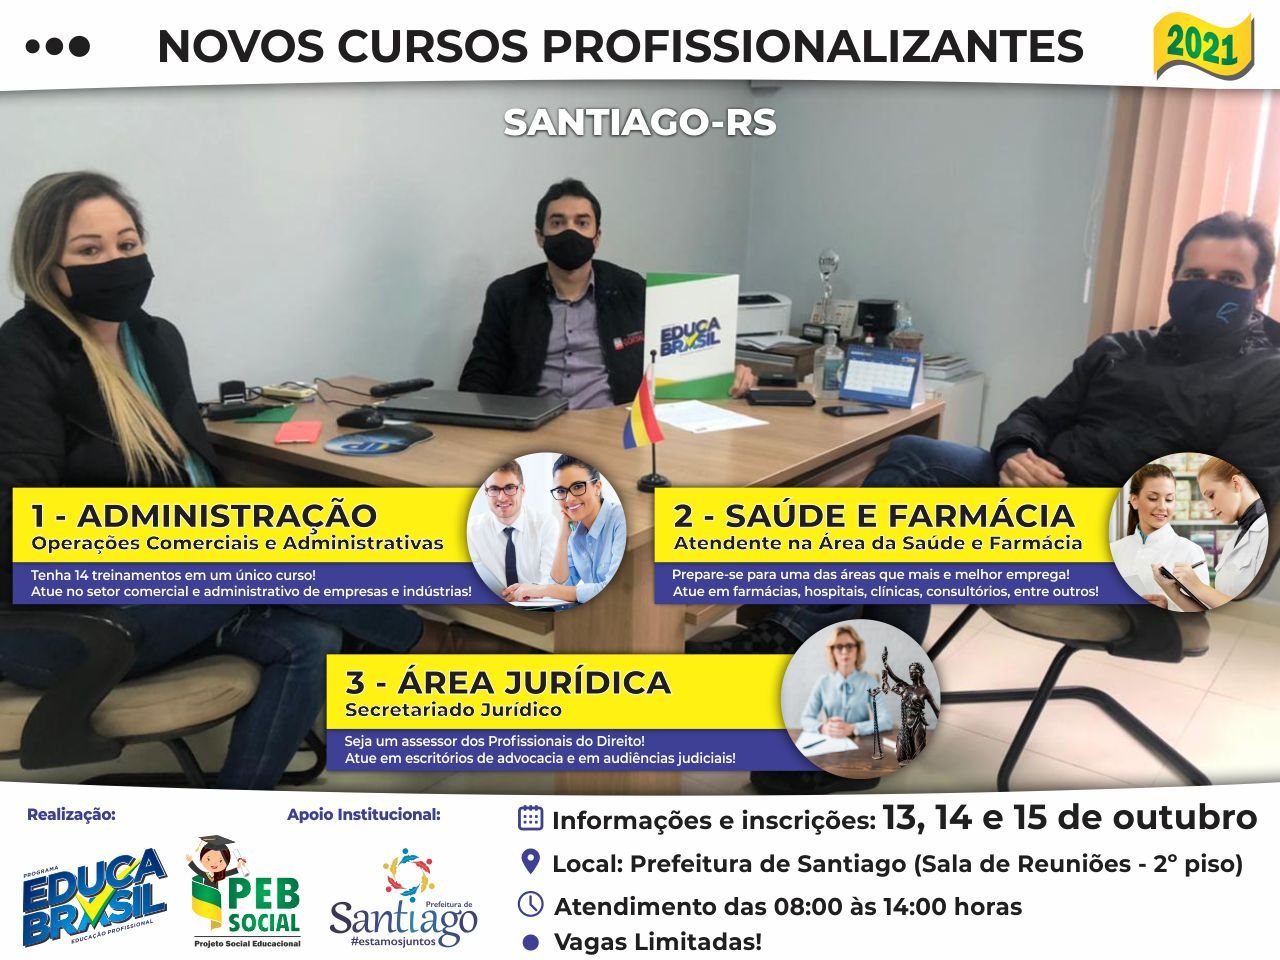 PEB Social   Cursos Profissionalizantes 2021   Santiago/RS